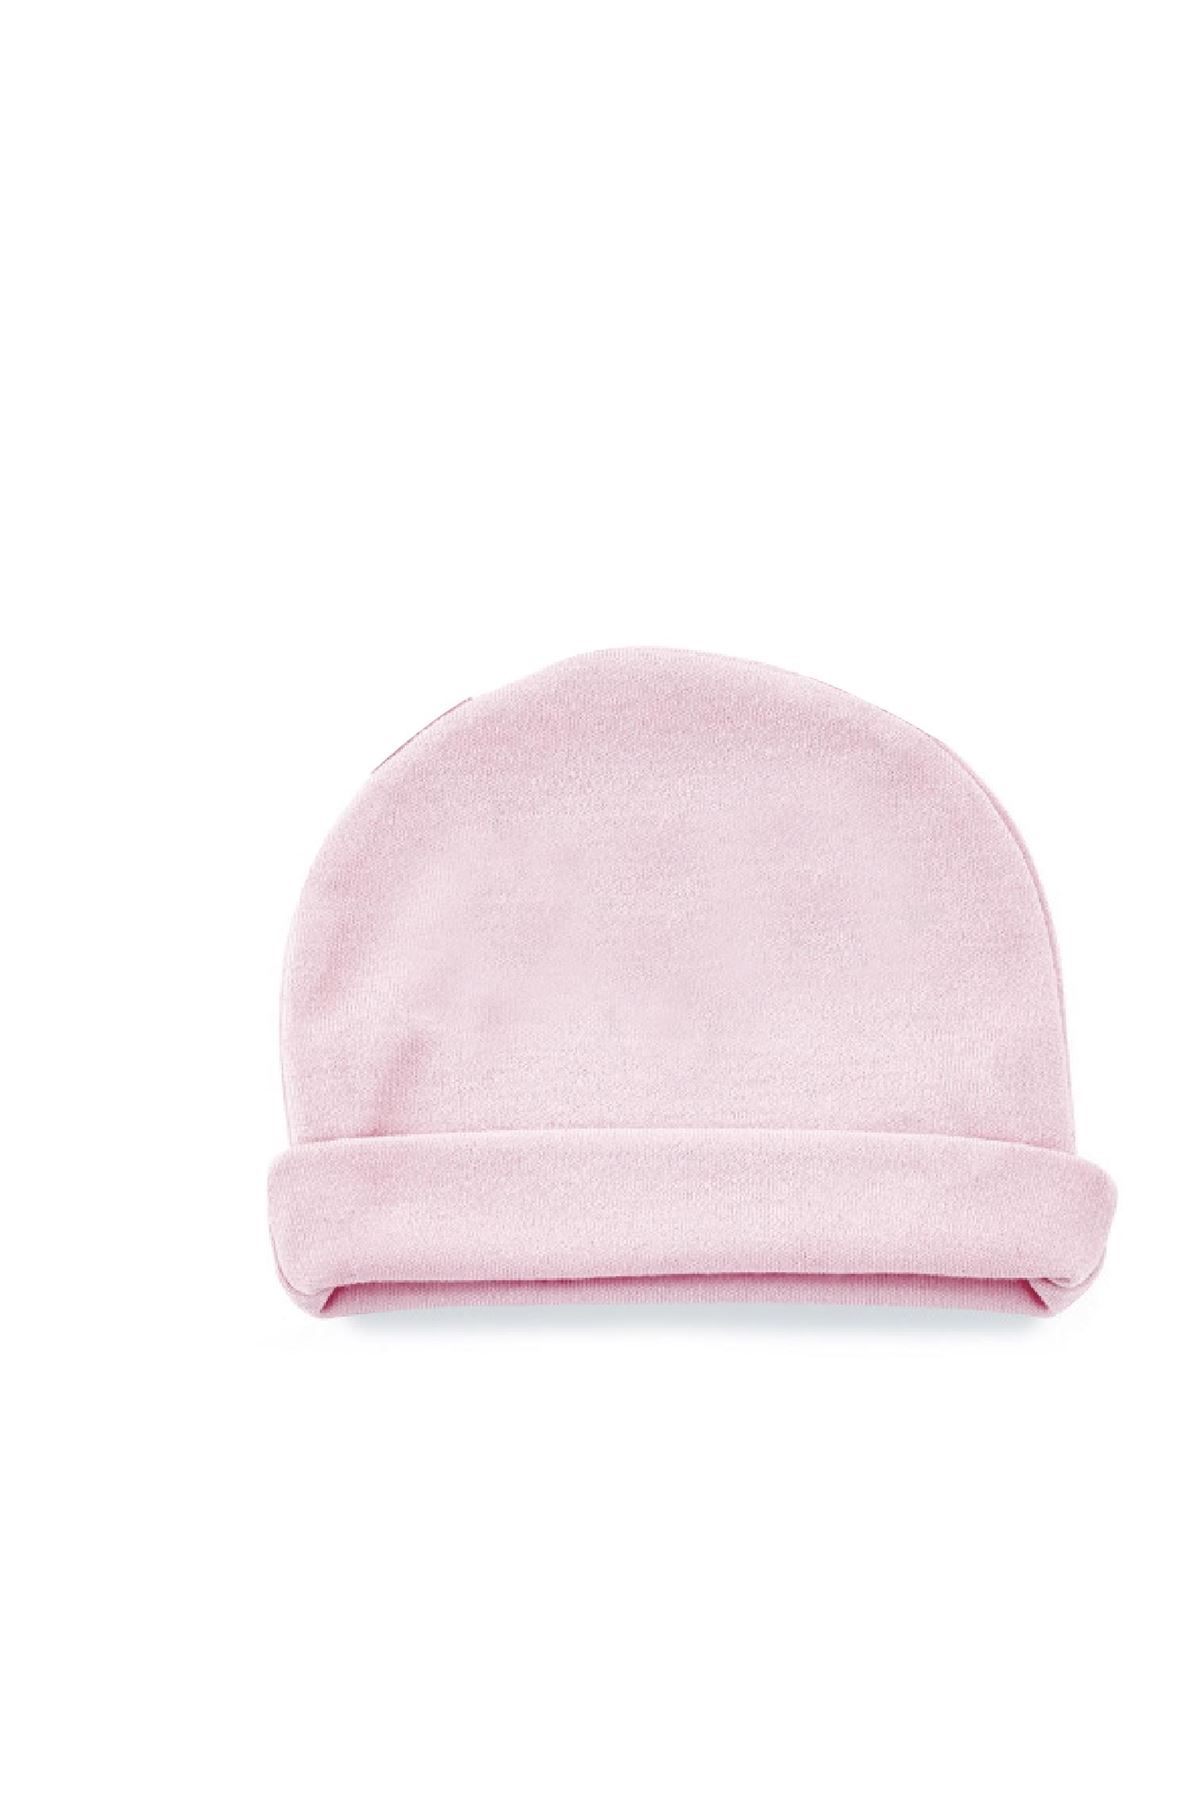 BabyJem Yenidoğan Bebe Şapka 397 Pembe